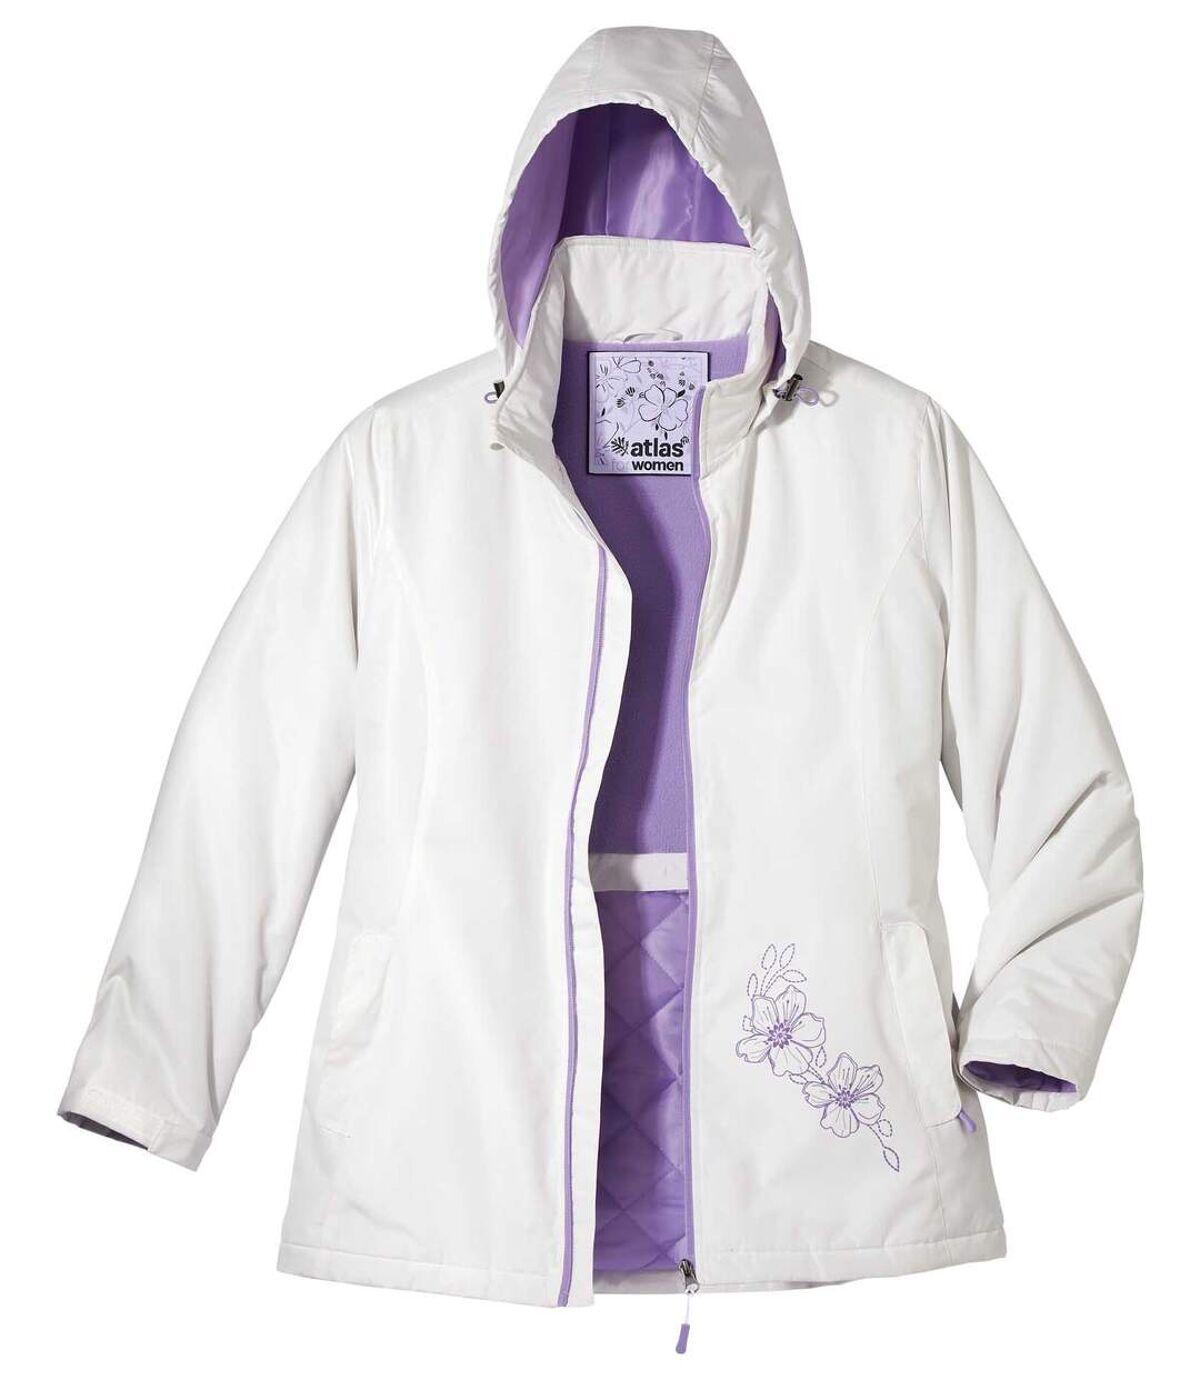 Fantazyjna kurtka z tkaniny Microtech  Atlas For Men